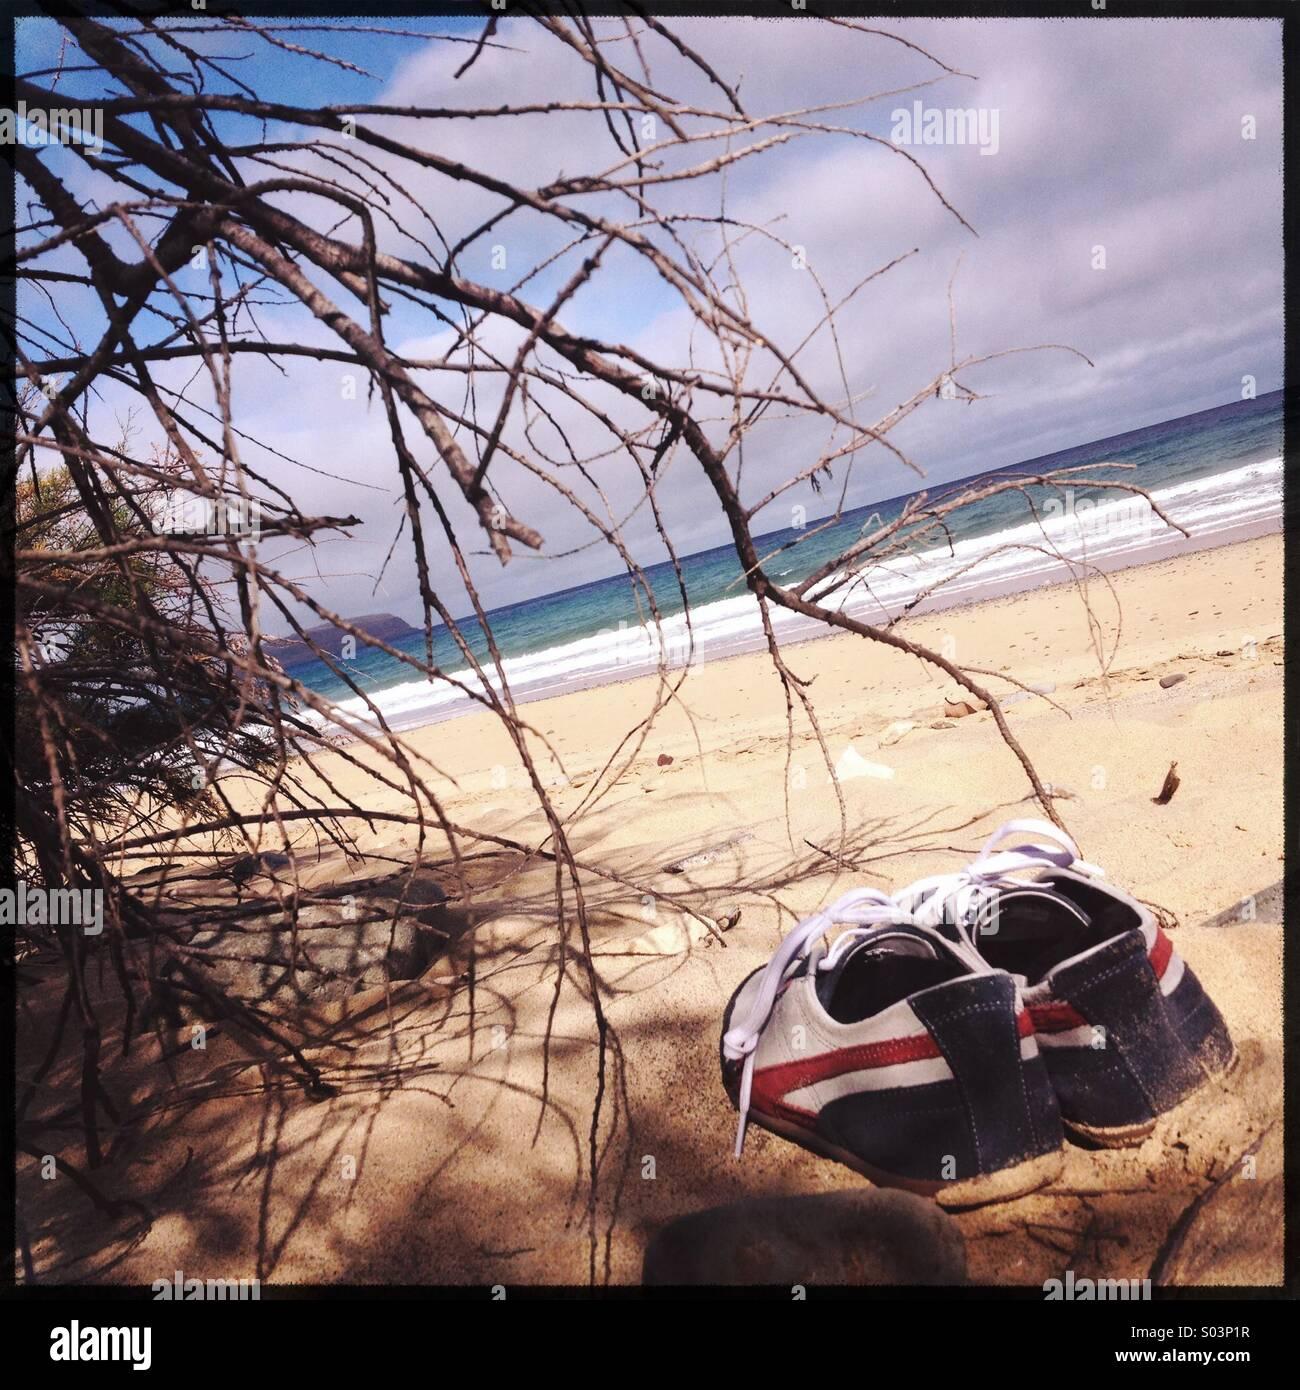 Heaven beach - Stock Image